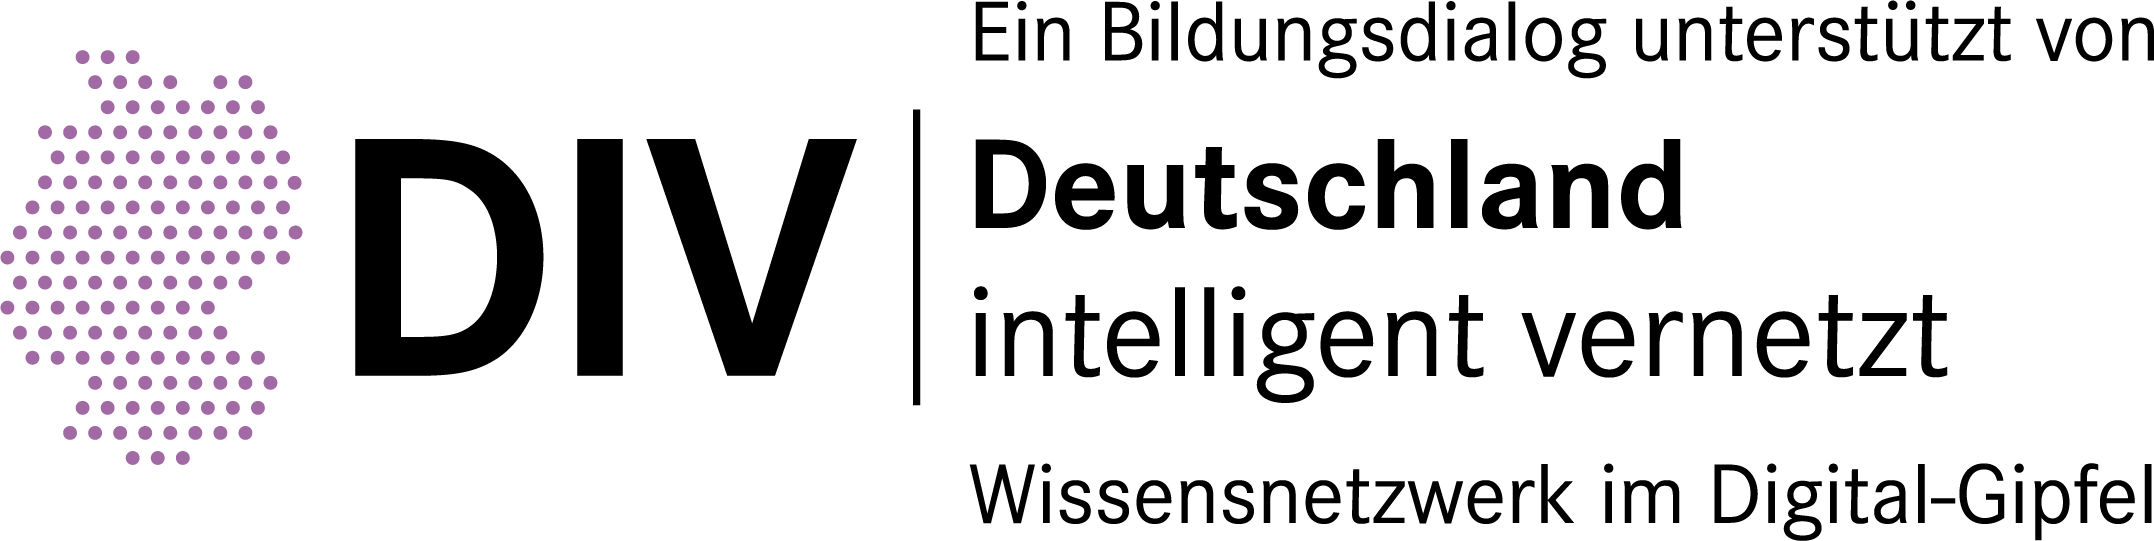 DIV_Signet_Bildungsdialog_RGB_p